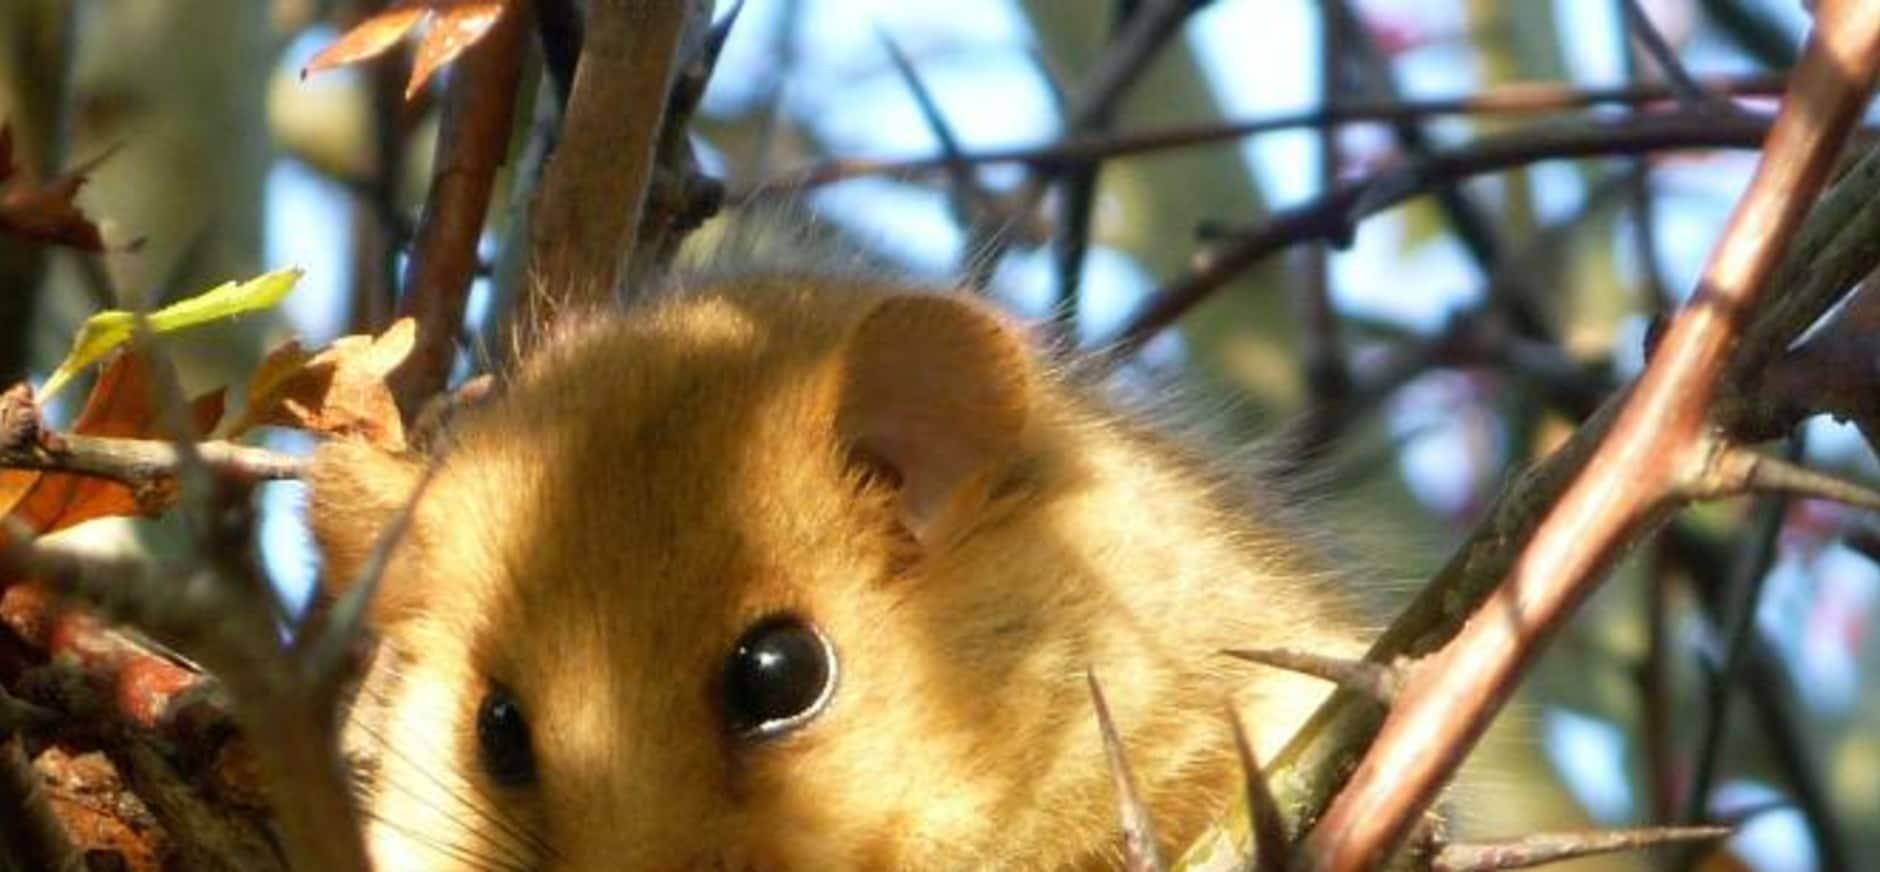 Vloggende Zuid-Limburgse boswachters